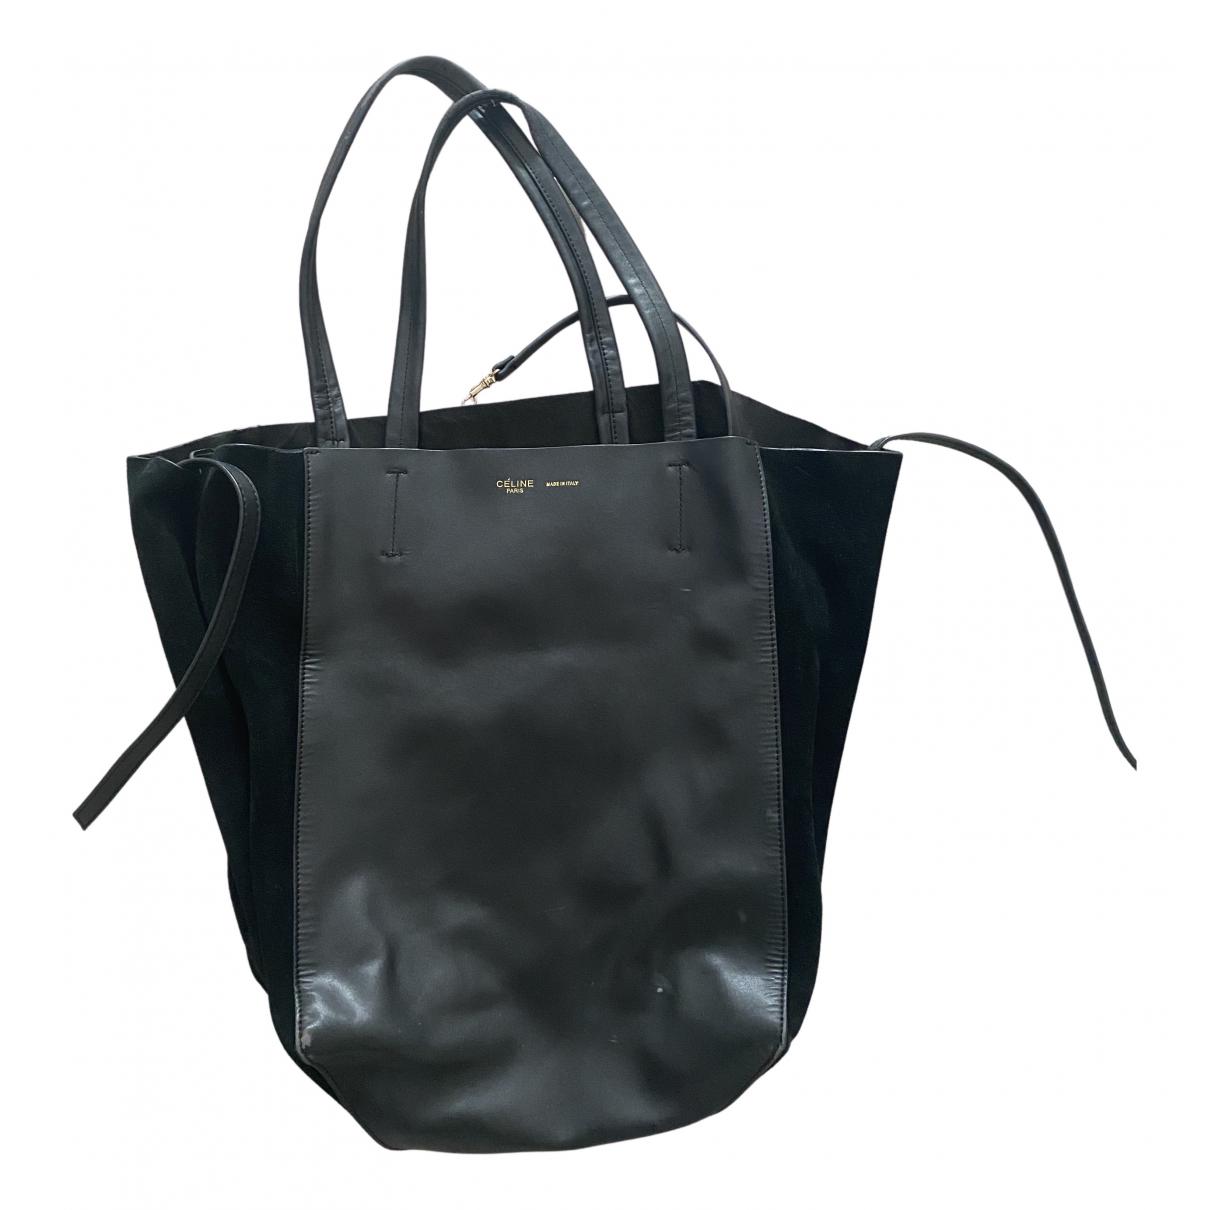 Celine Cabas Phantom Handtasche in  Schwarz Leder